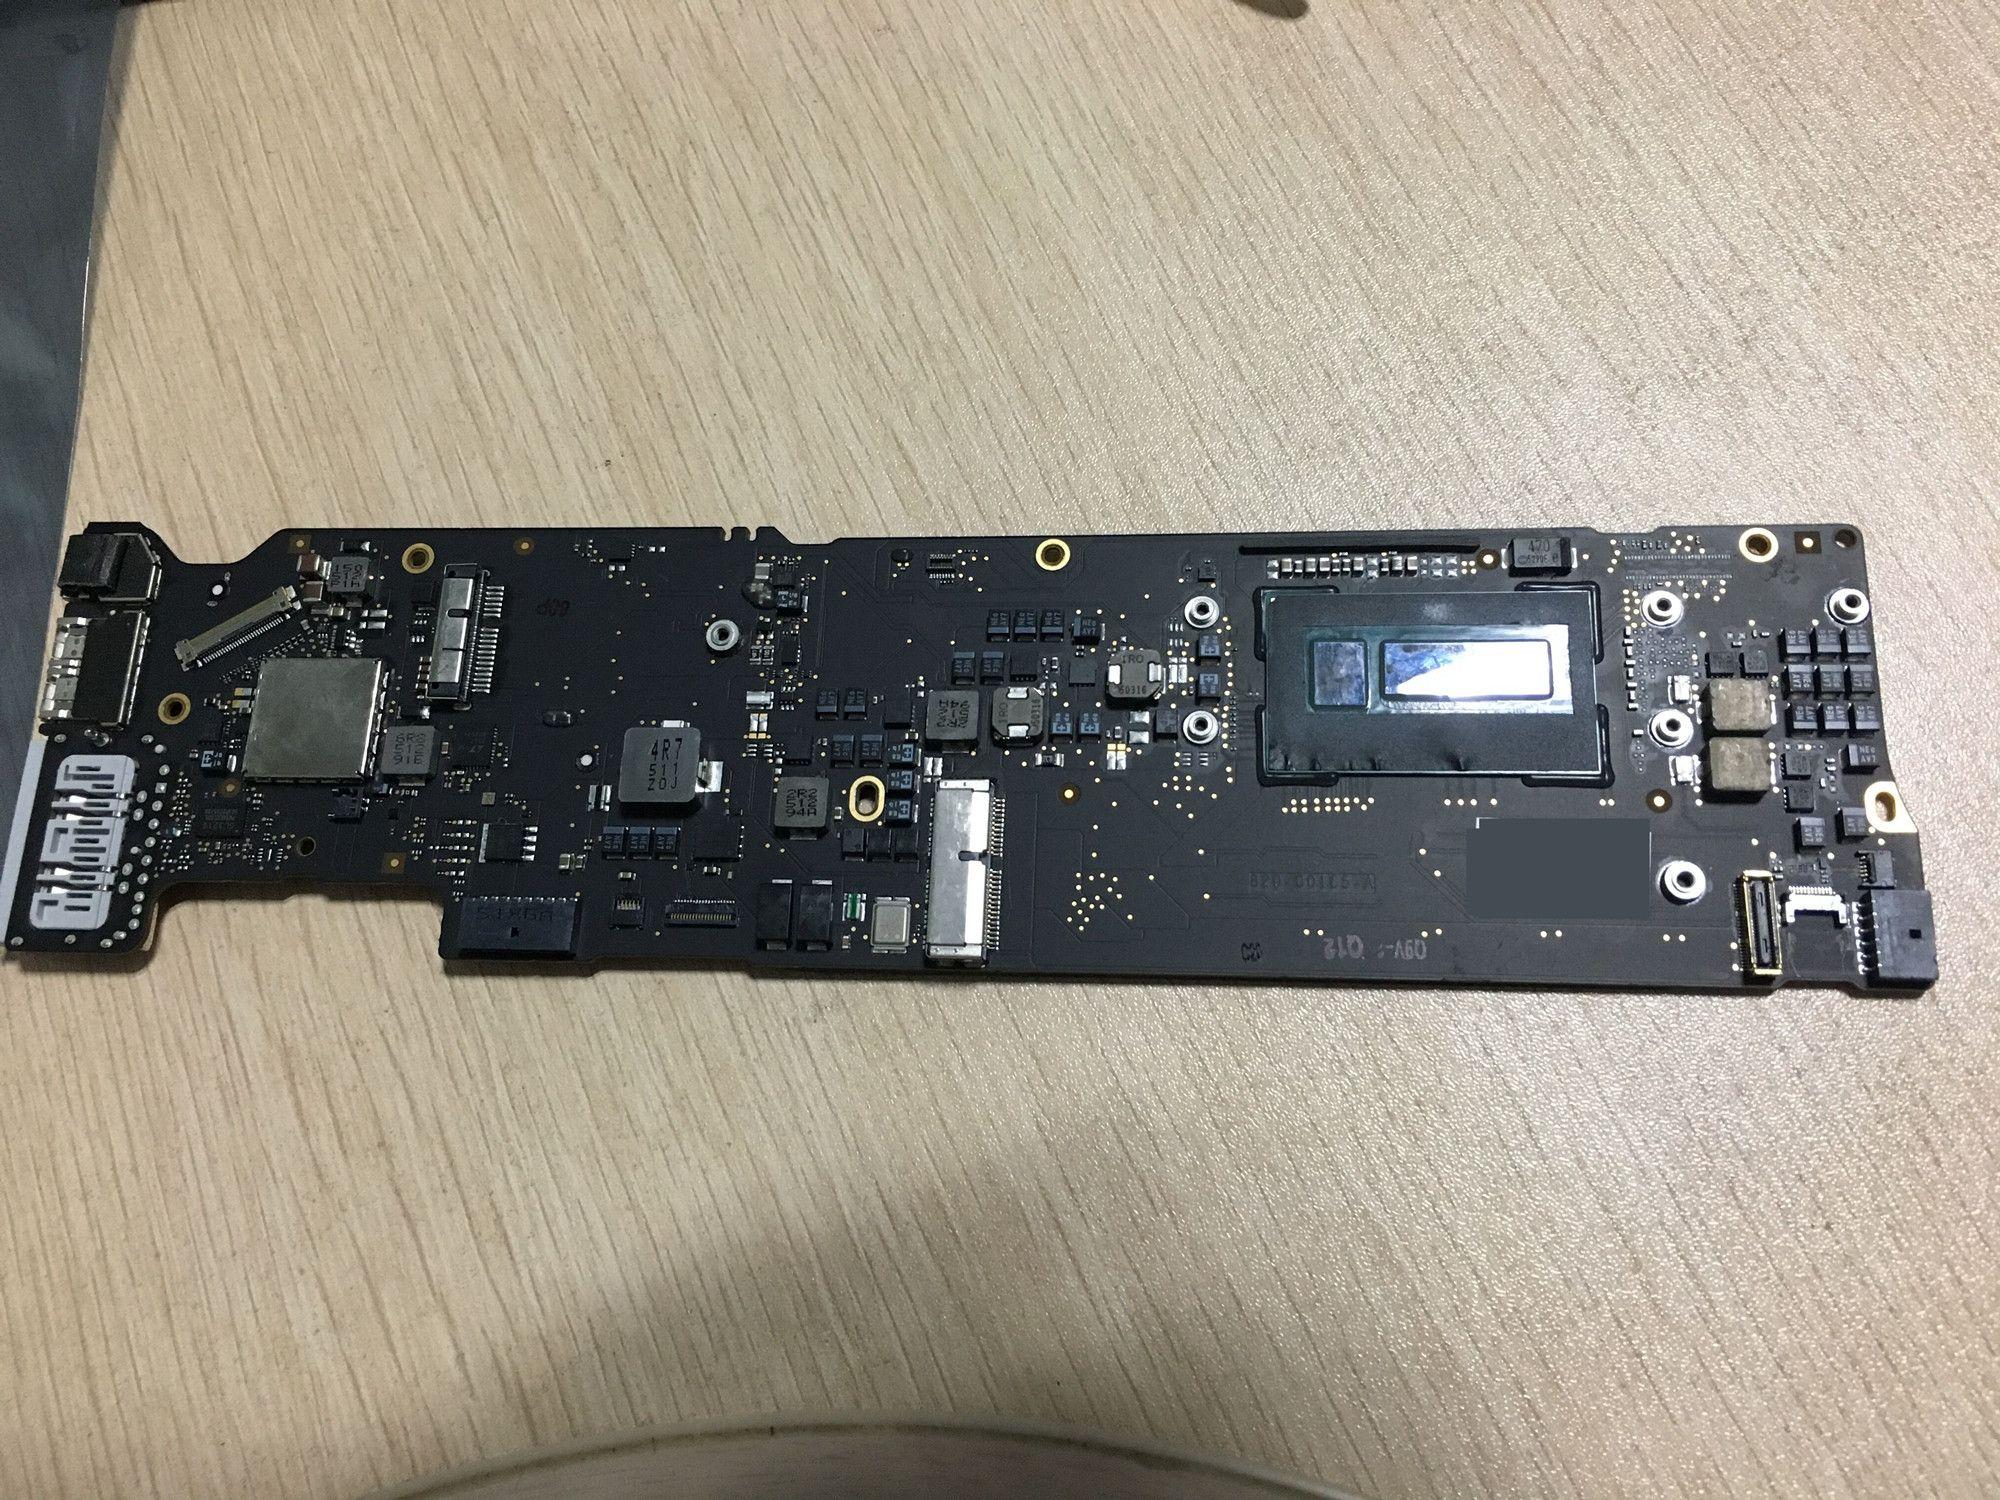 for MacBook Air 13 3 A1466 Logic board for 820-00165-A 661-02394 Early 2015  Logic Board 1 6 GHz Core i5 8GB RAM